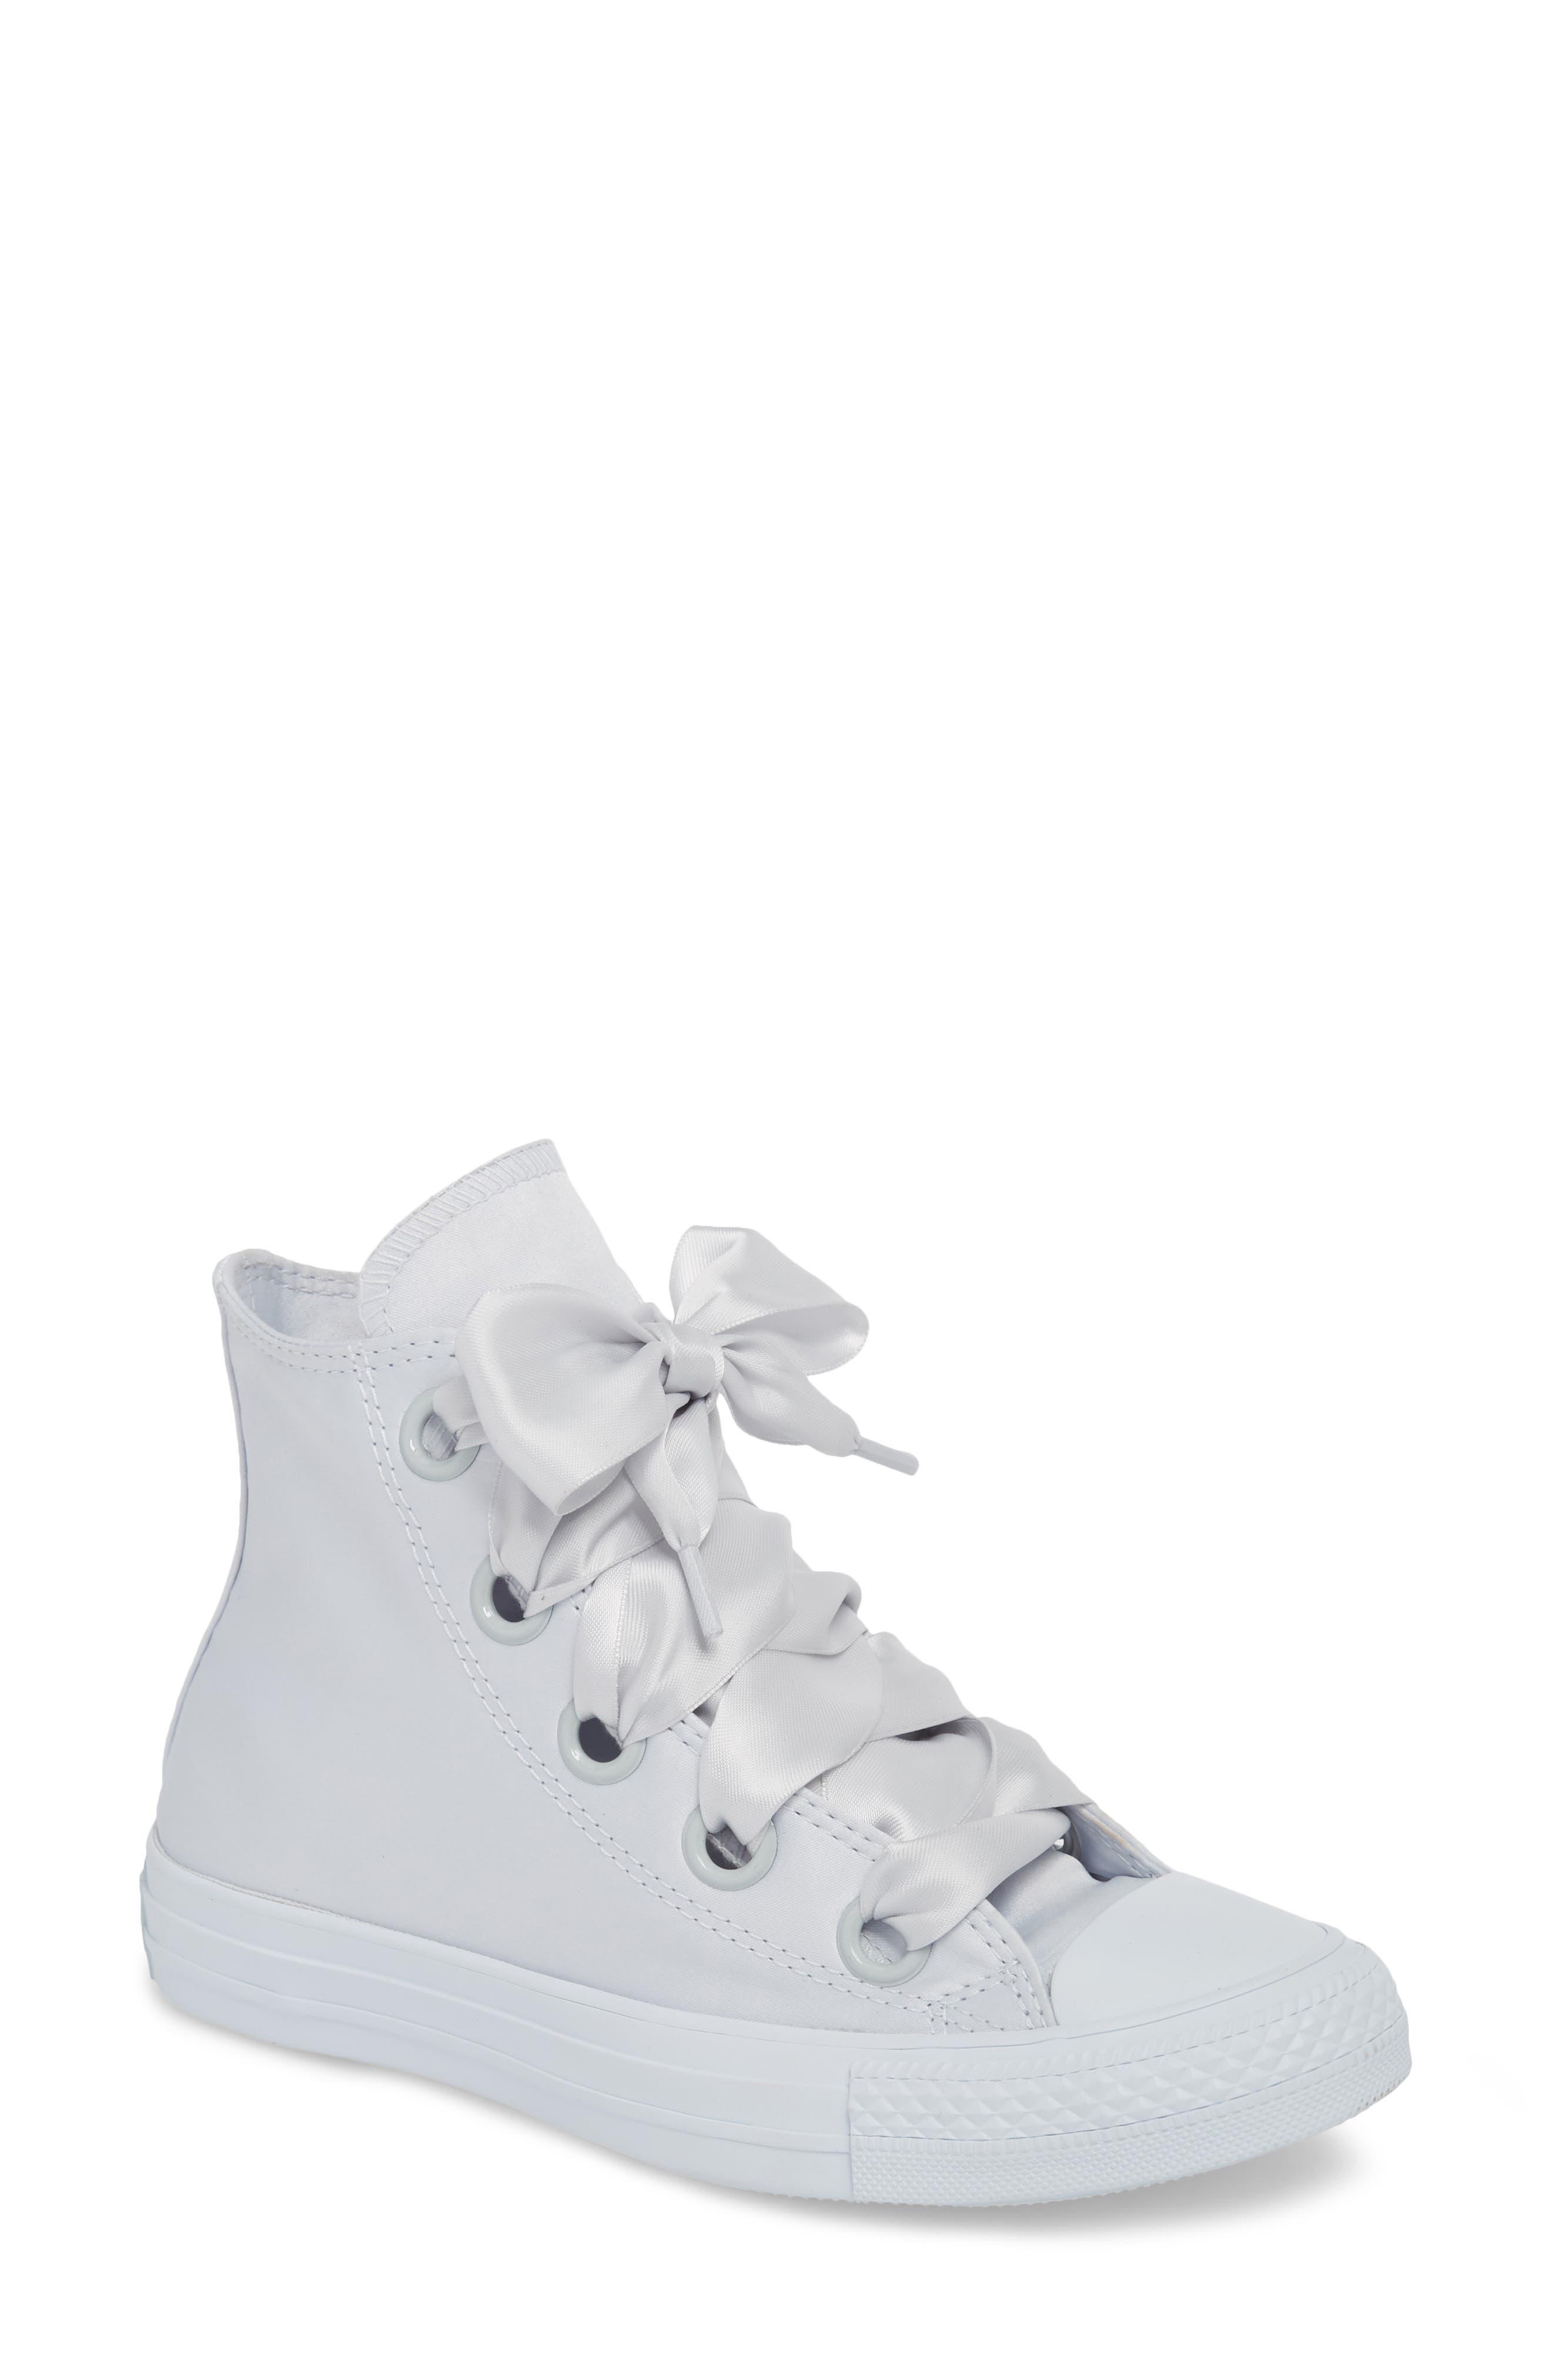 Chuck Taylor<sup>®</sup> All Star<sup>®</sup> Big Eyelet High Top Sneaker,                             Main thumbnail 1, color,                             Platinum